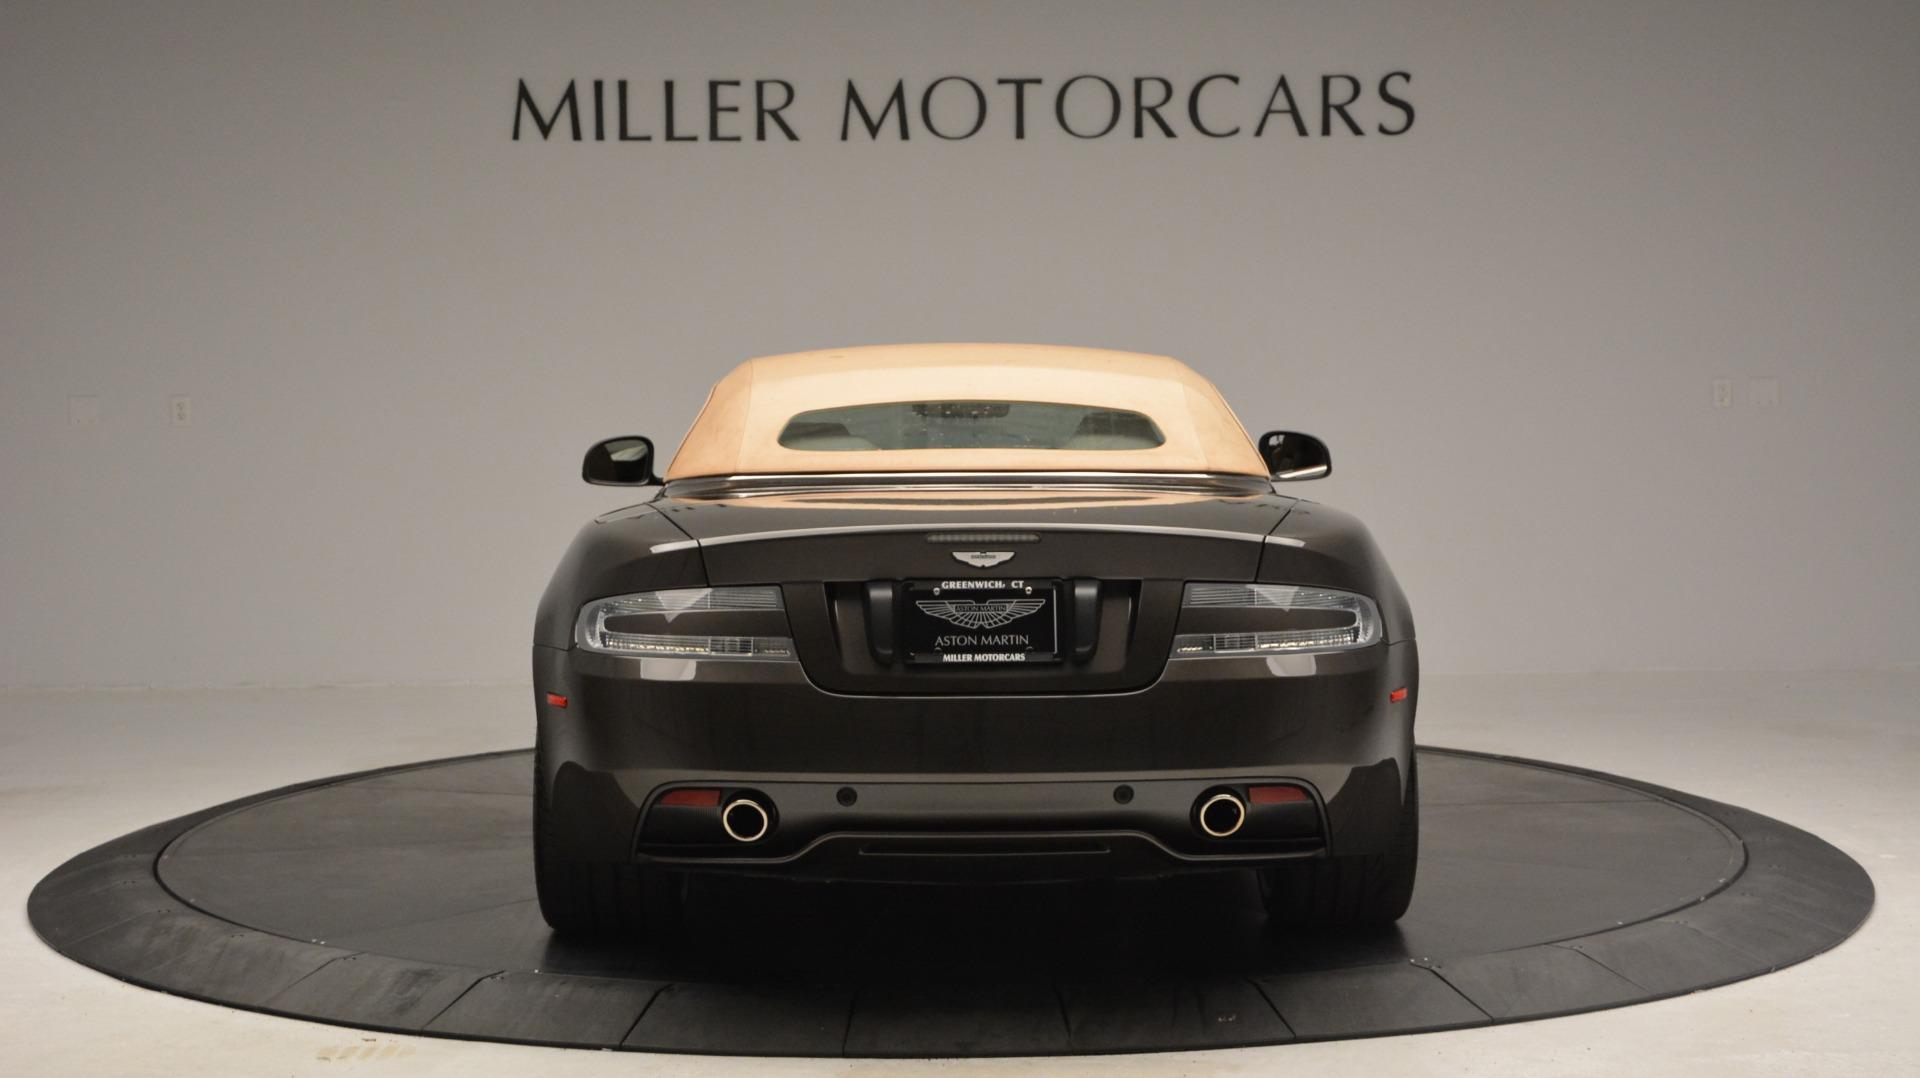 Used 2012 Aston Martin Virage Convertible For Sale In Greenwich, CT. Alfa Romeo of Greenwich, 7613 3351_p17